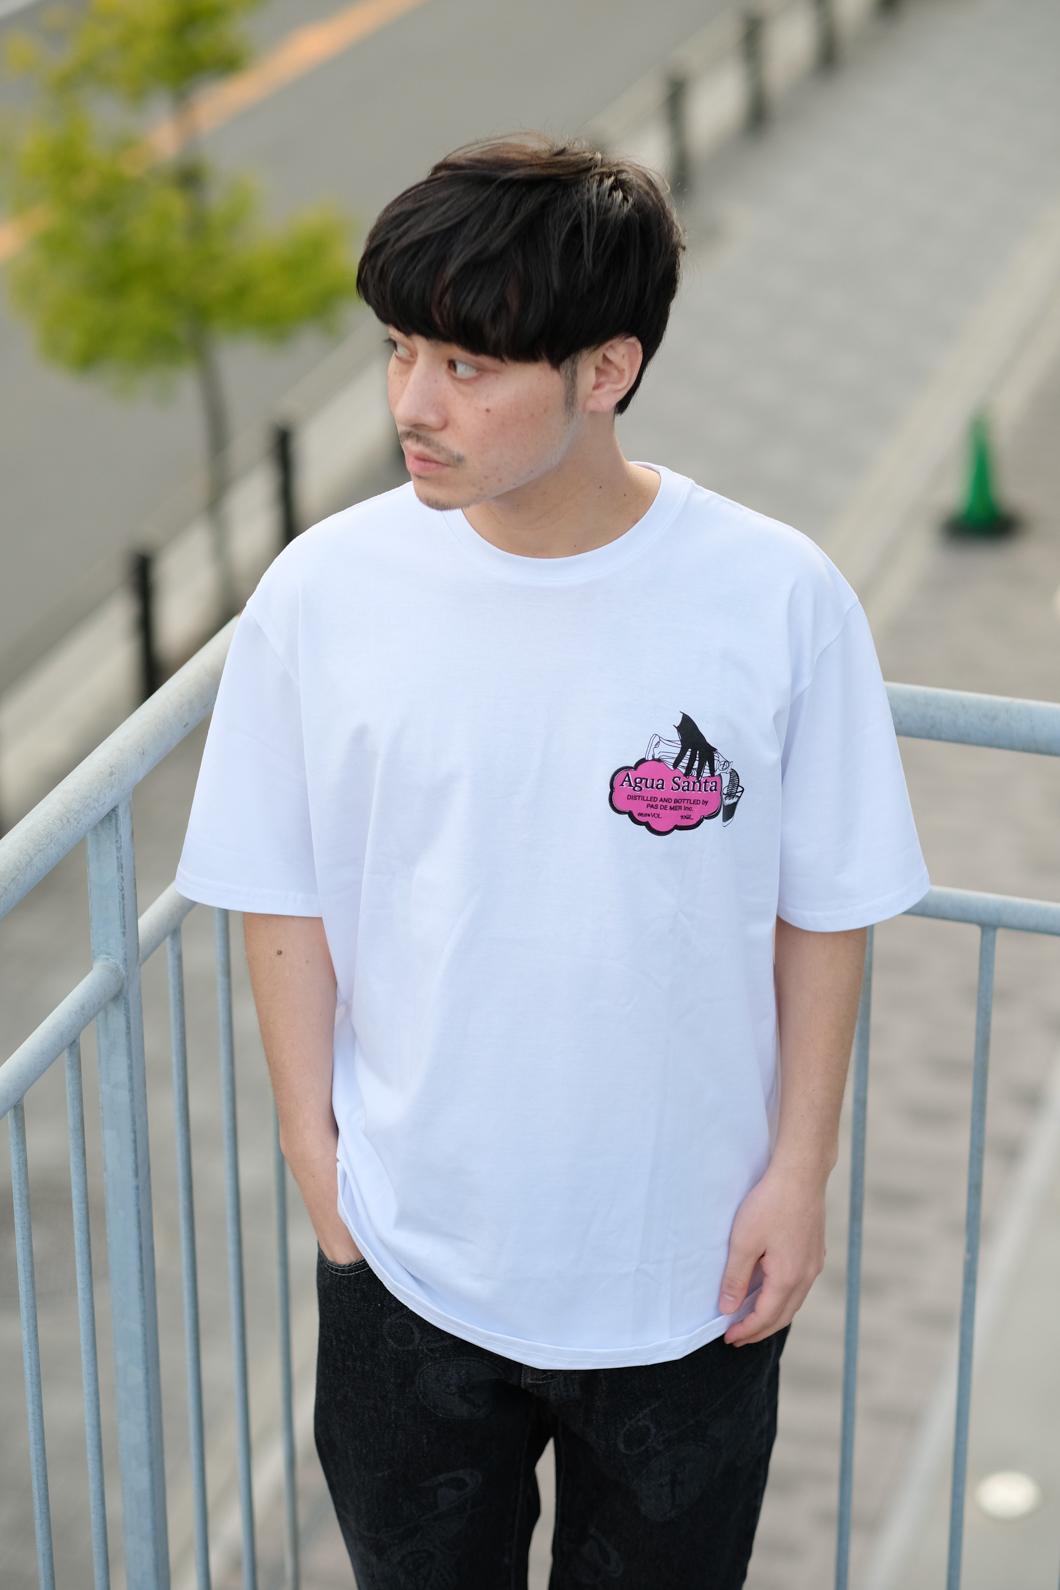 【PAS DE MER/パドゥメ】AGUA SANTA T-SHIRT Tシャツ / WHITE